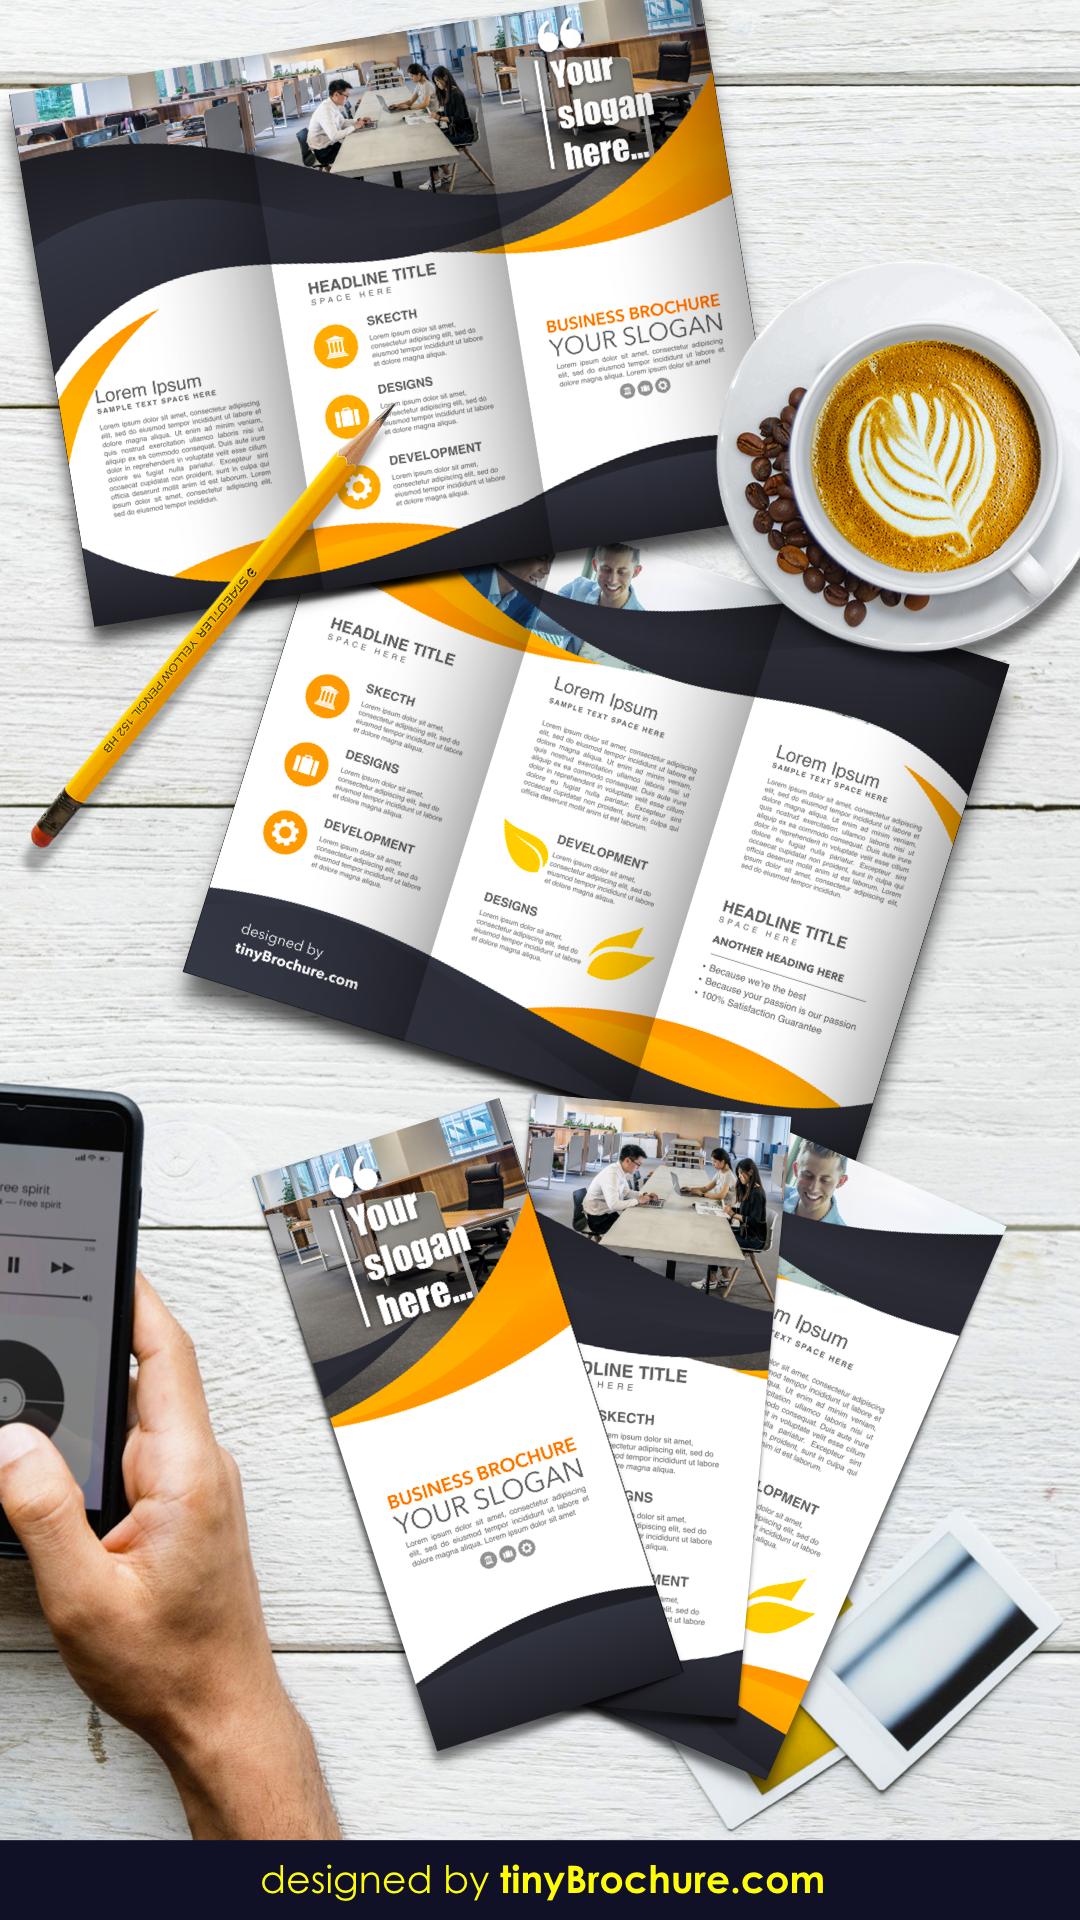 3 Panel Brochure Template Google Docs Brochure Template Pamphlet Template Brochure Design Template